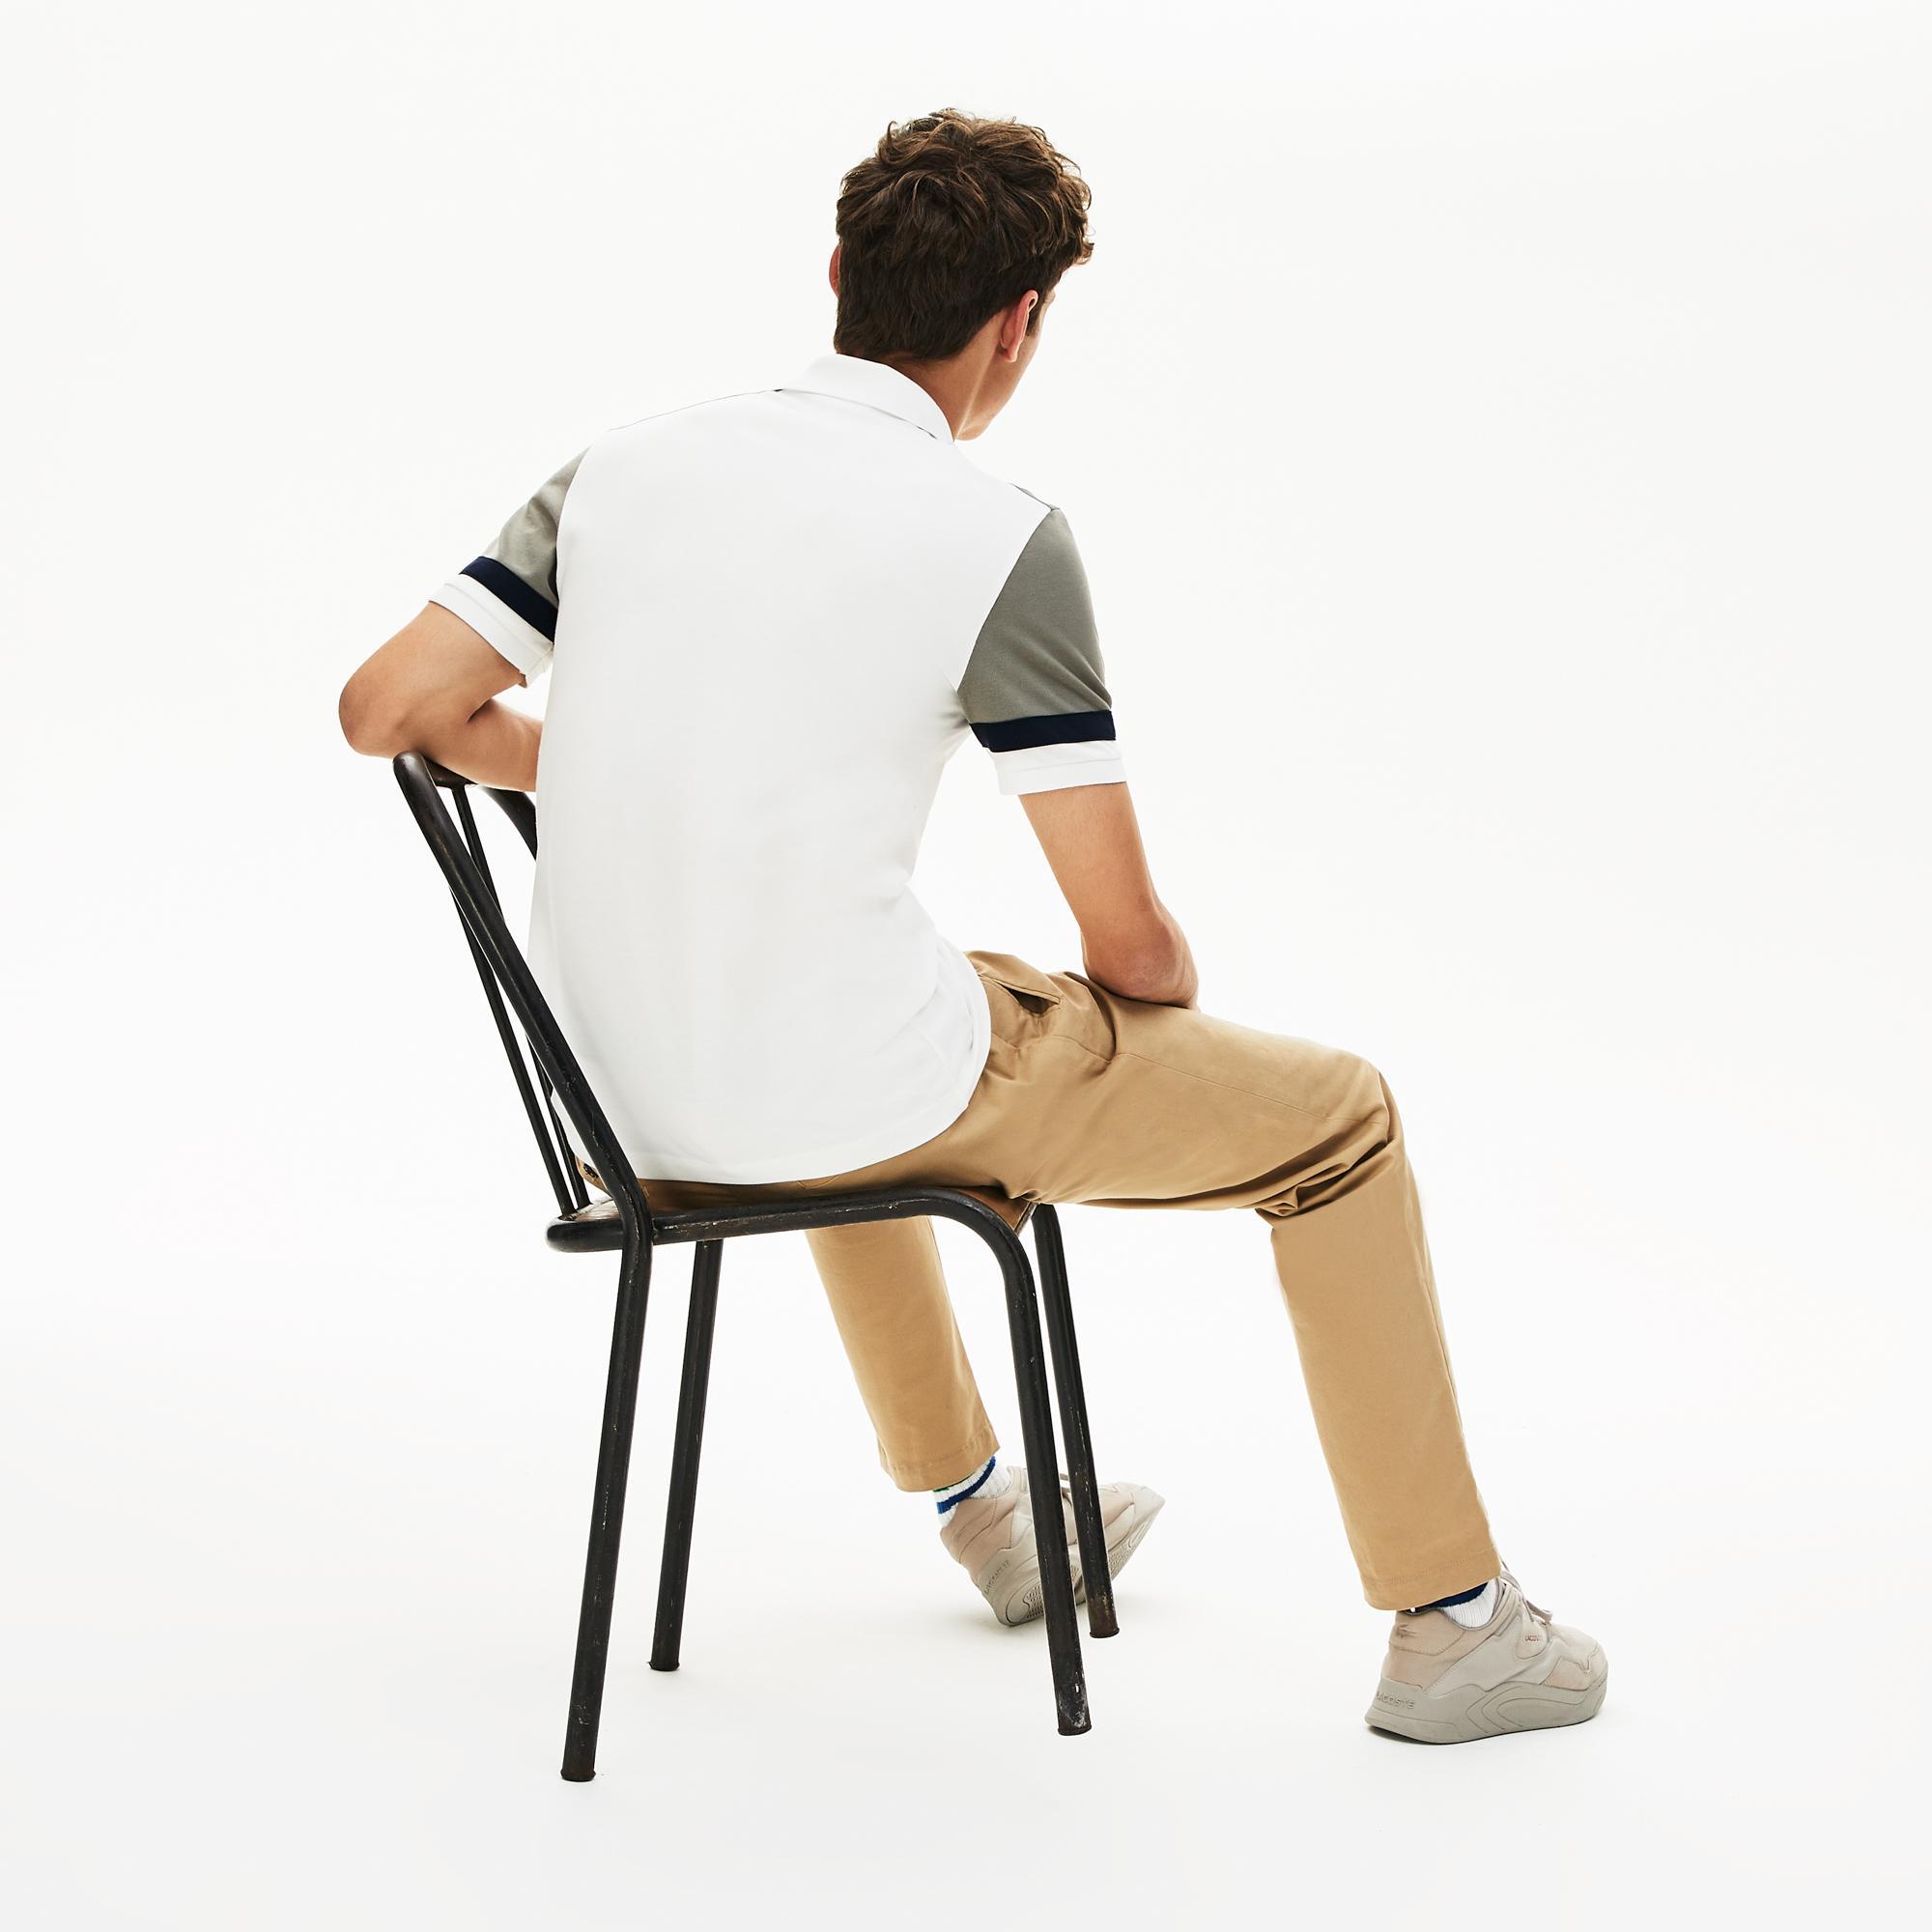 Lacoste Erkek Slim Fit Blok Desenli Beyaz Polo